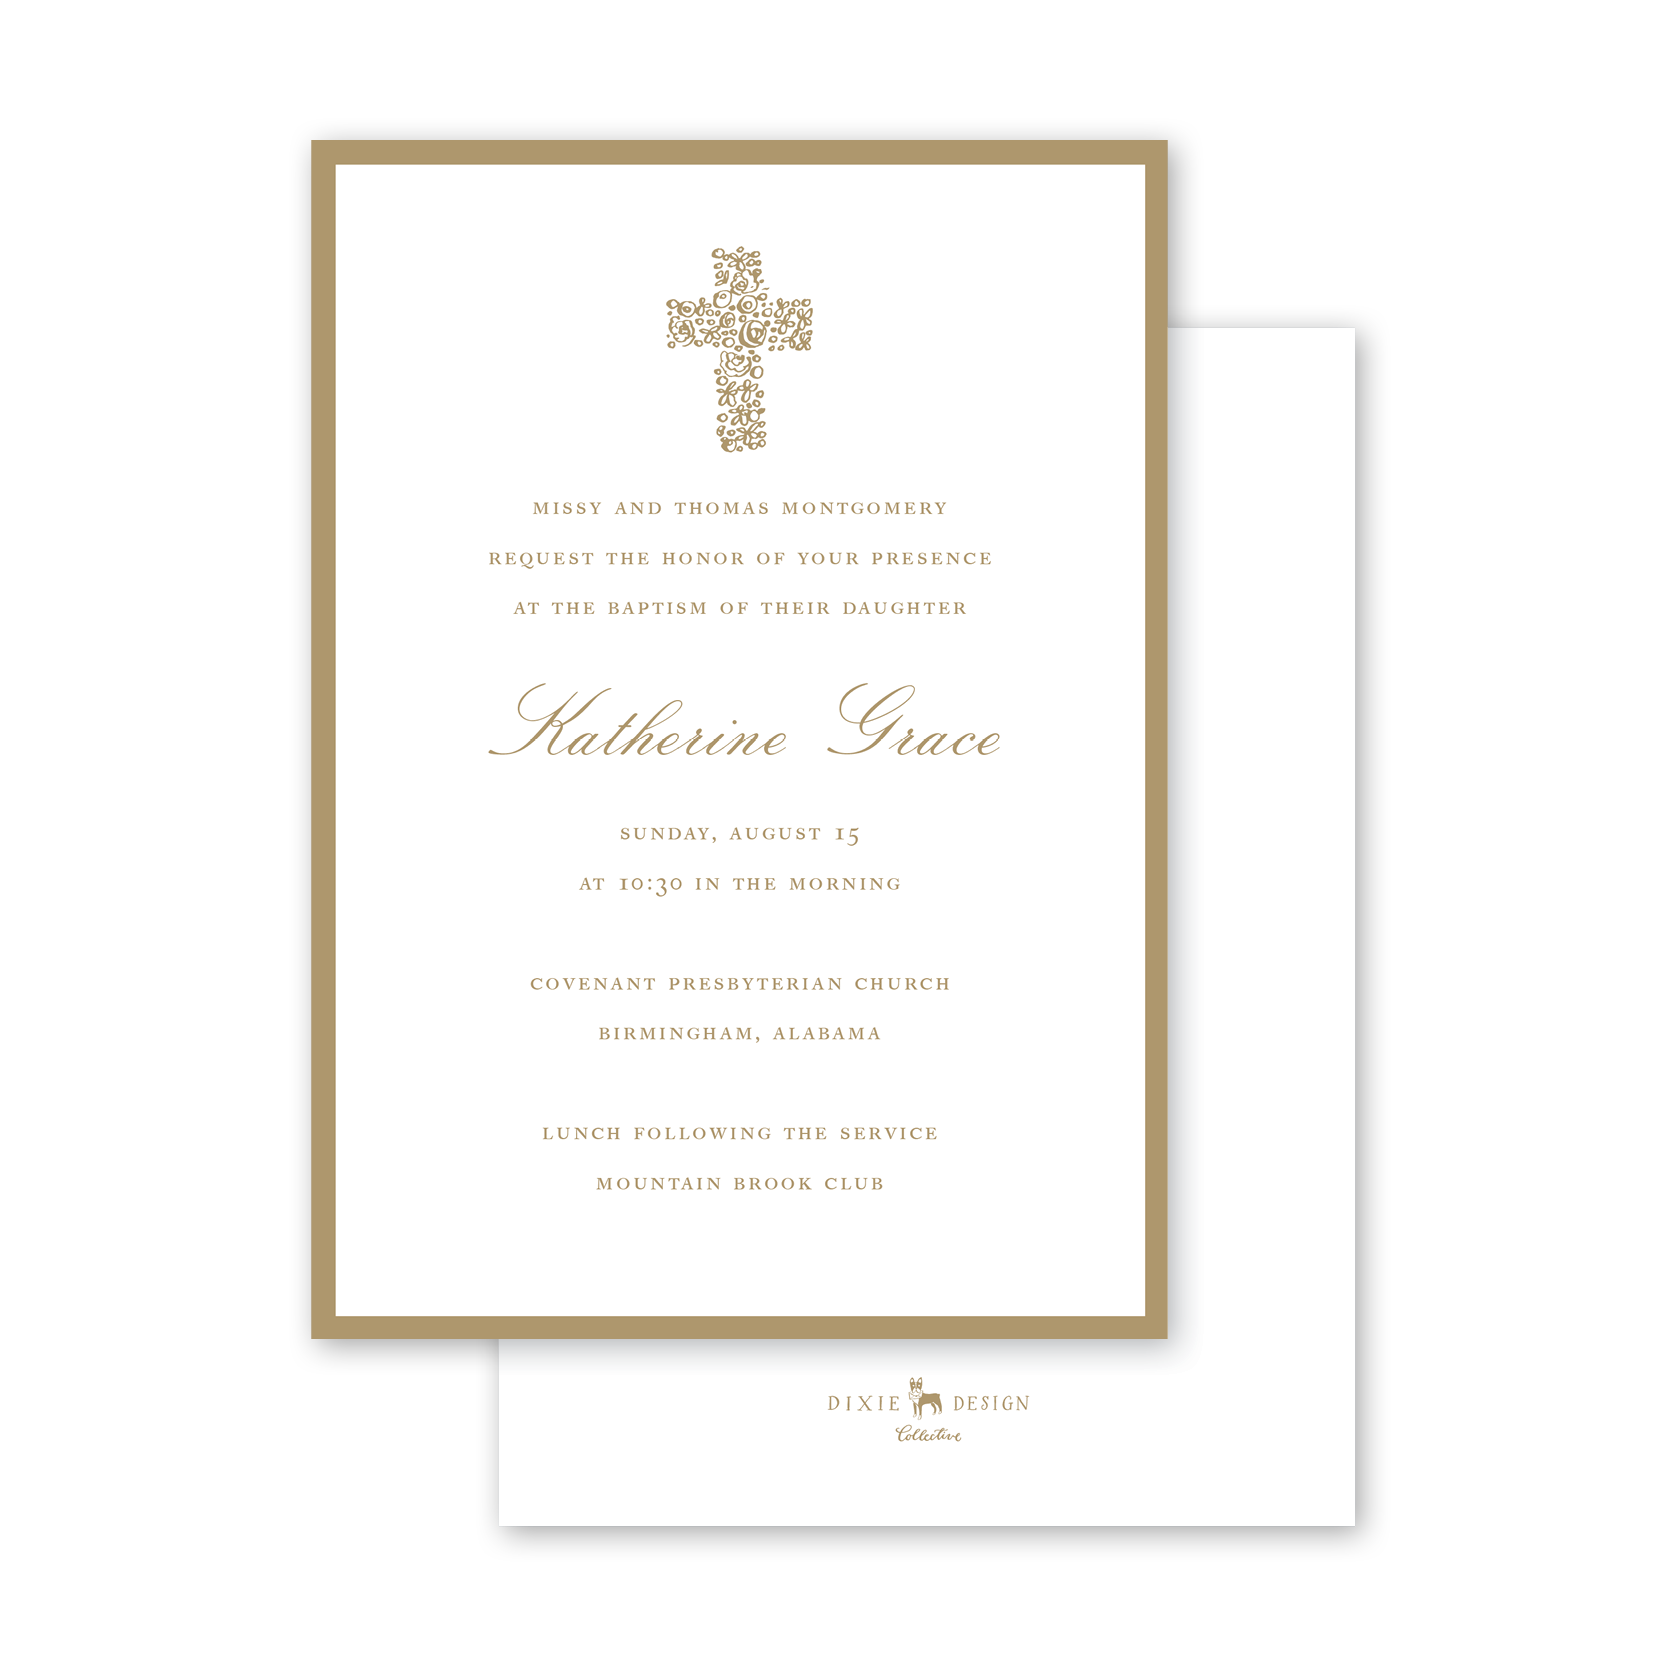 2017_Hollon_Floral Cross Gold_Baptism Invitation_A7_Thumb_1.png